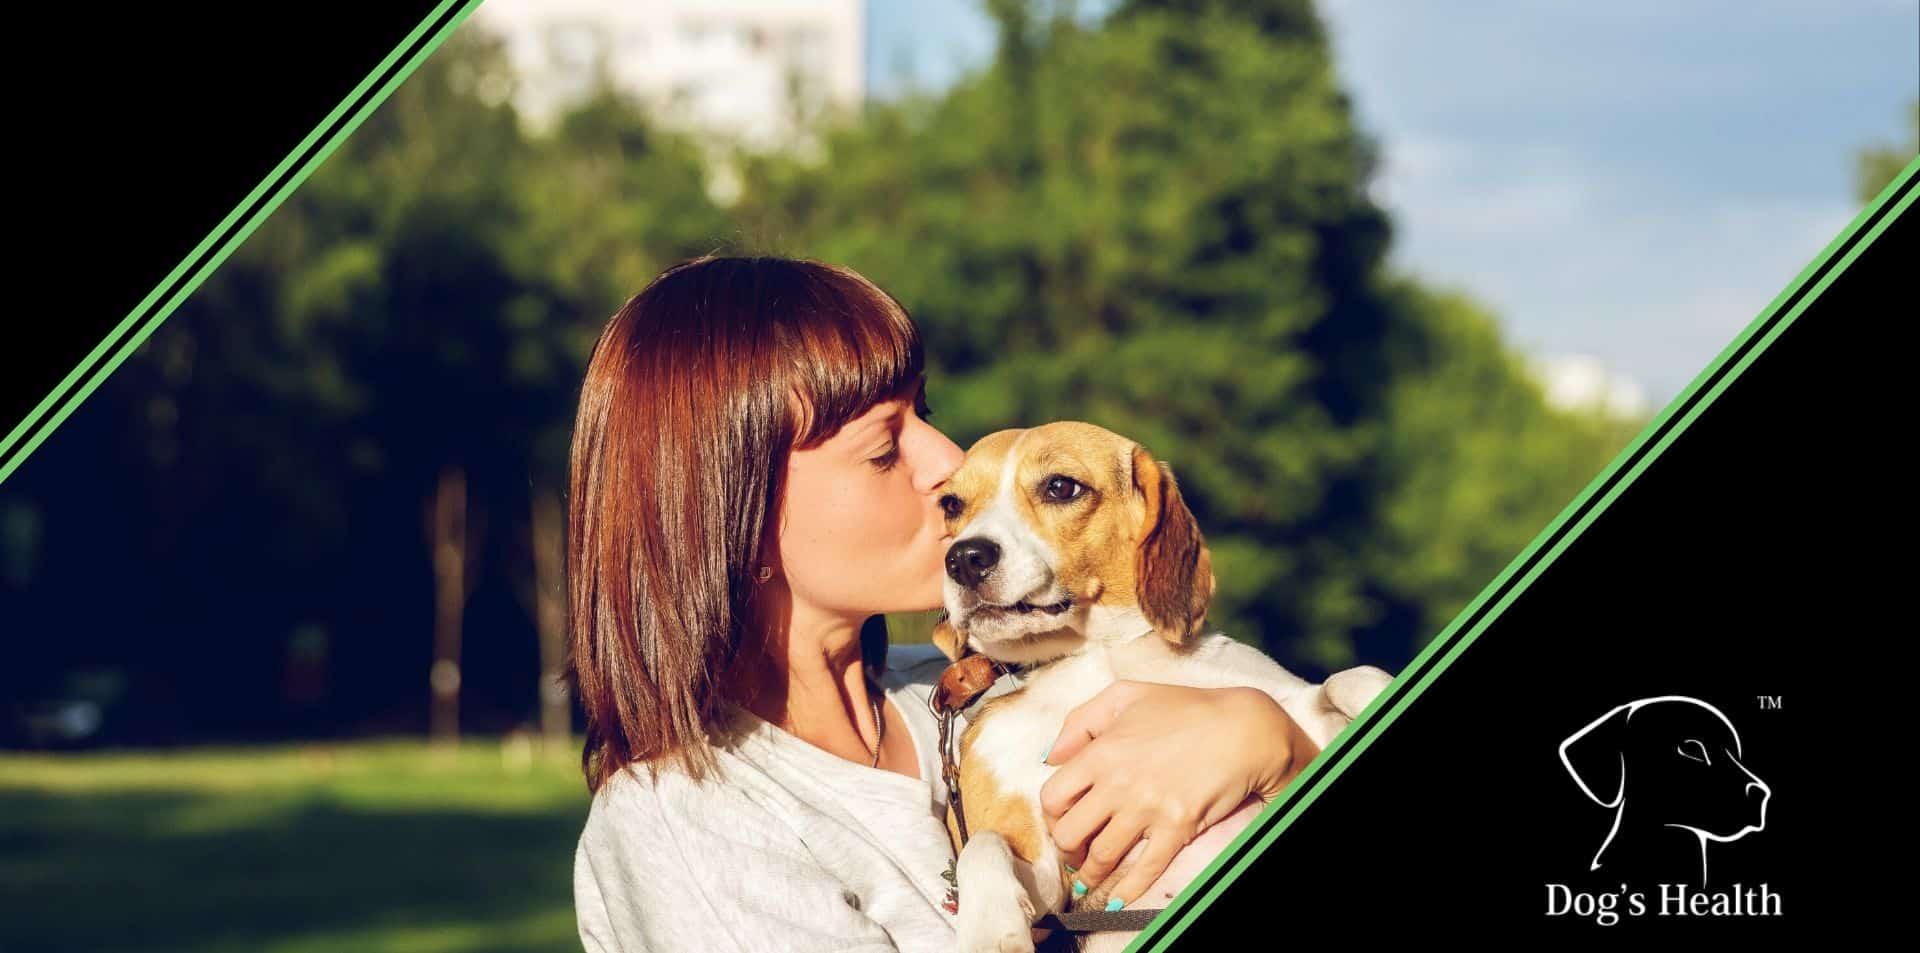 malattie trasmissibili dai cani all'uomo